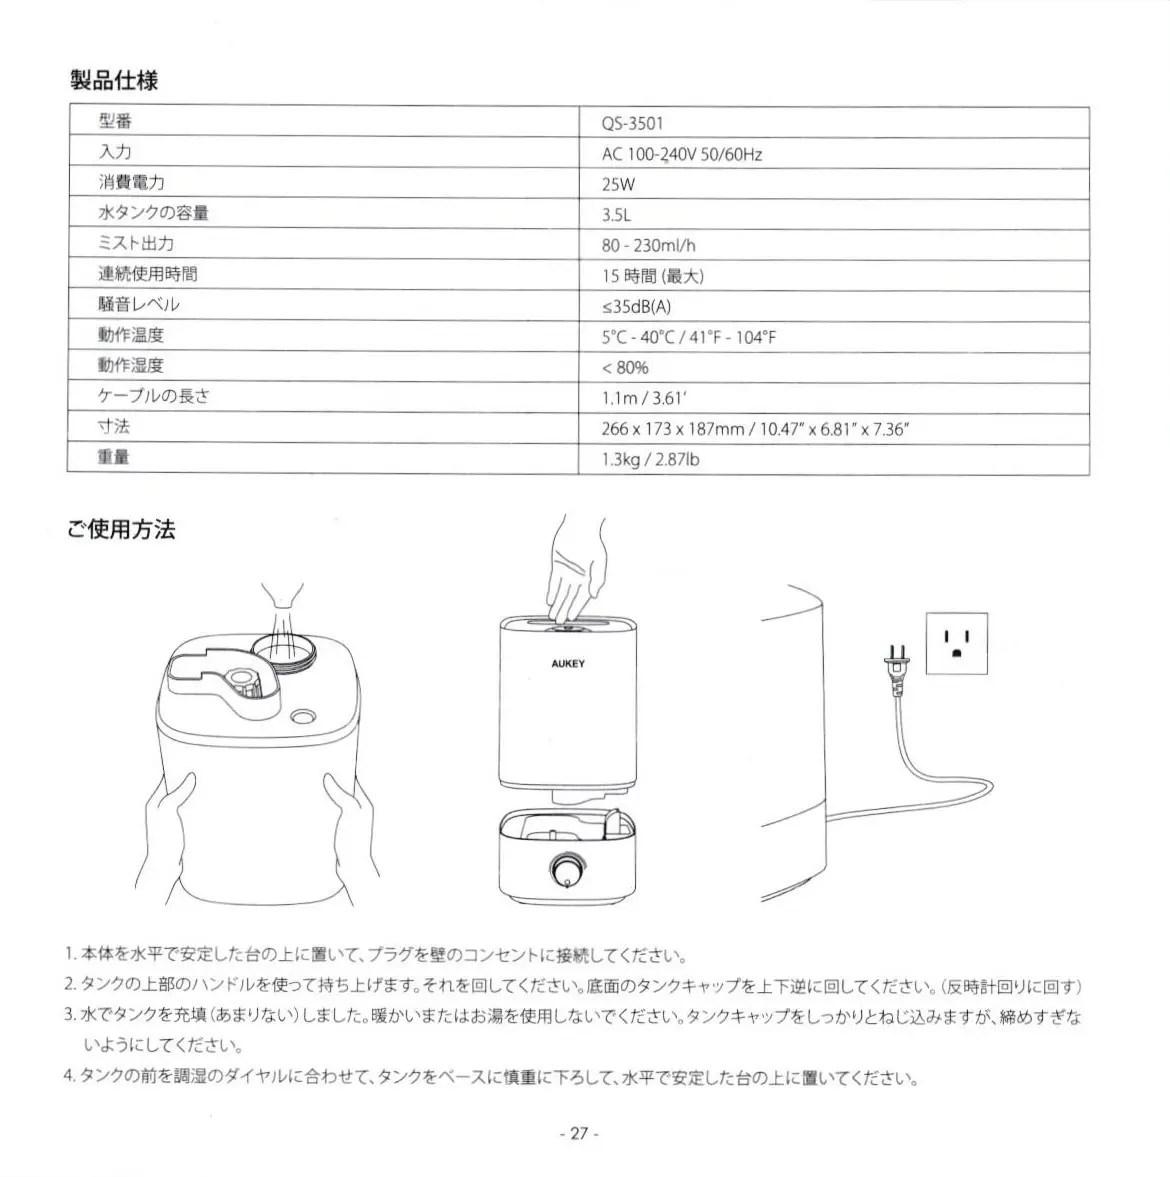 AUKEY 加湿器 超音波クールミスト加湿器 取説 2